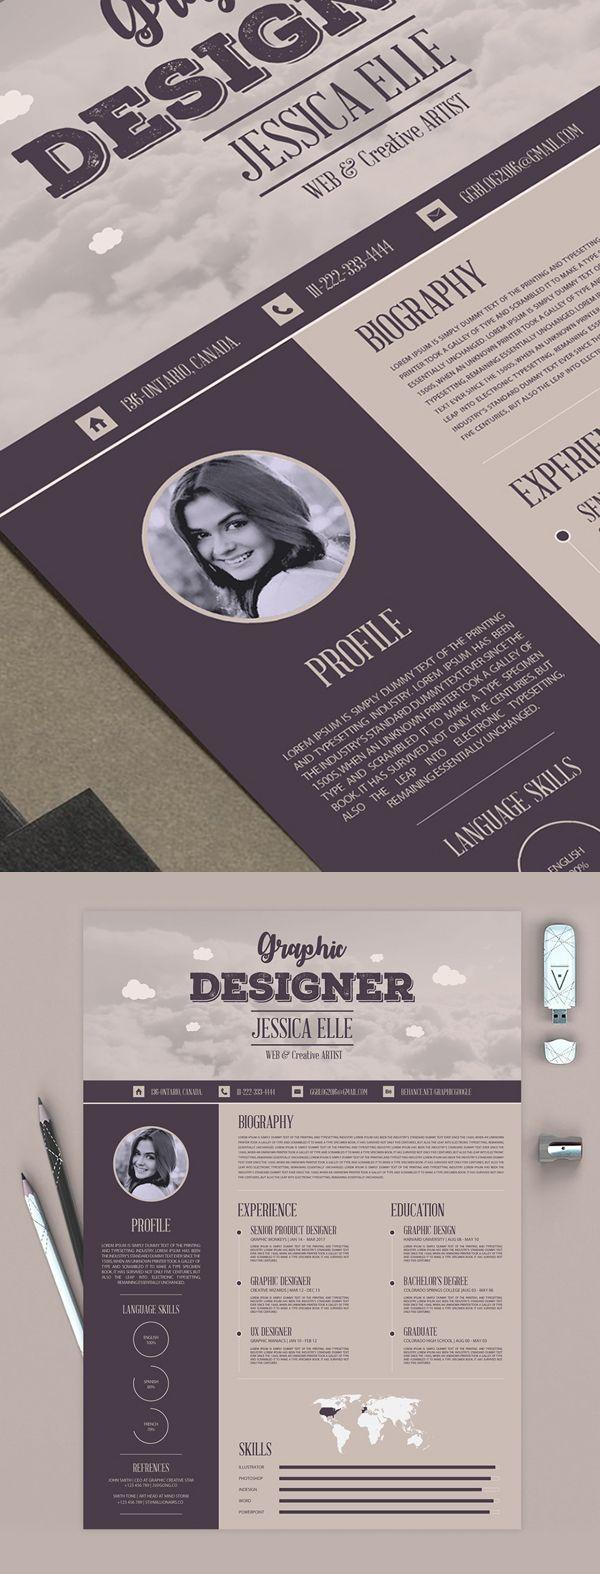 Free Creative Vintage Resume Design Template | Graphic design ...